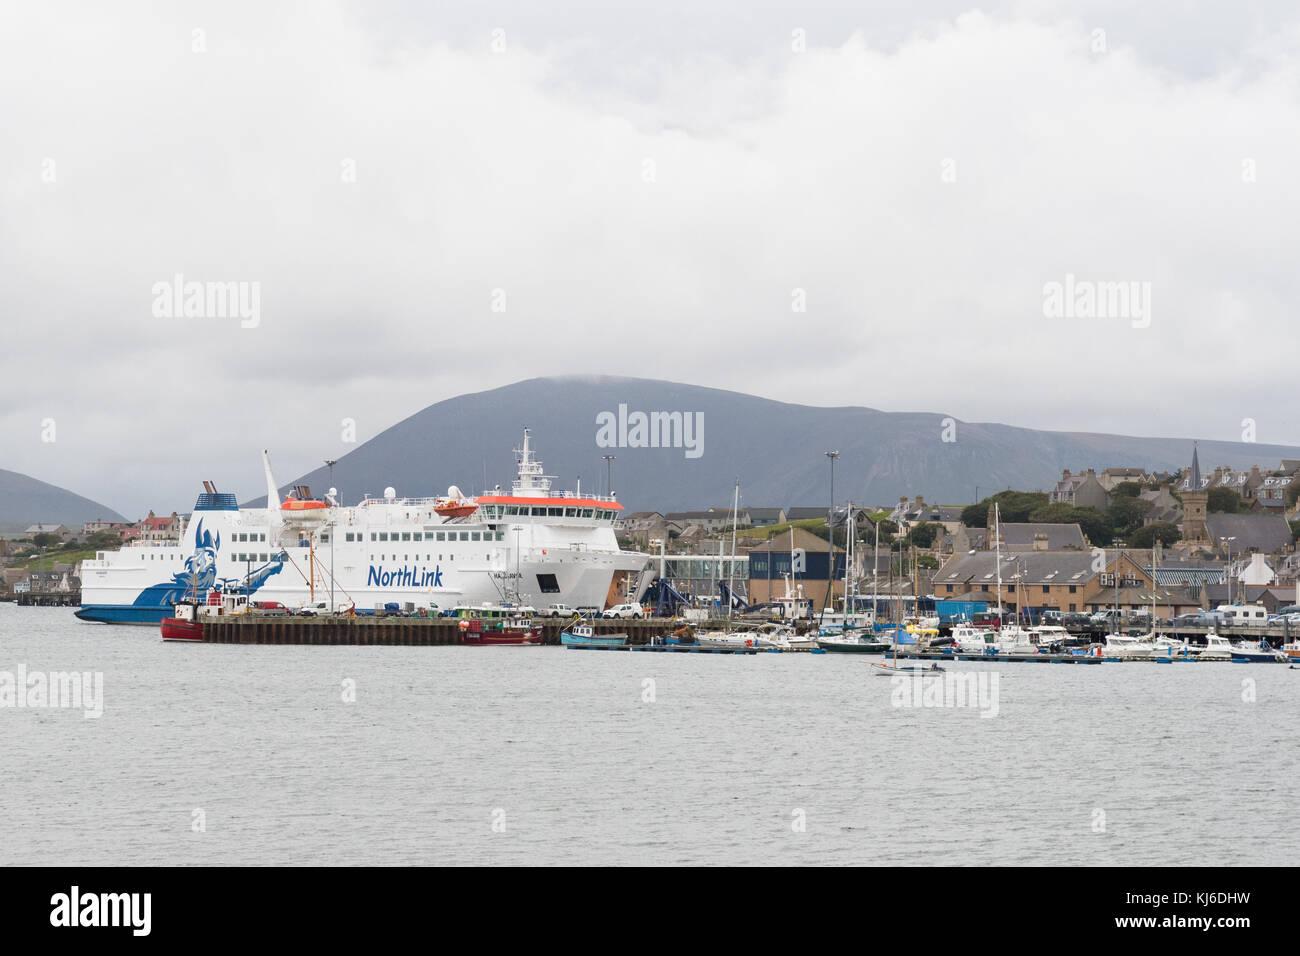 MV Hamnavoe Northlink ferry docked at Stromness, Orkney, Scotland, UK - Stock Image